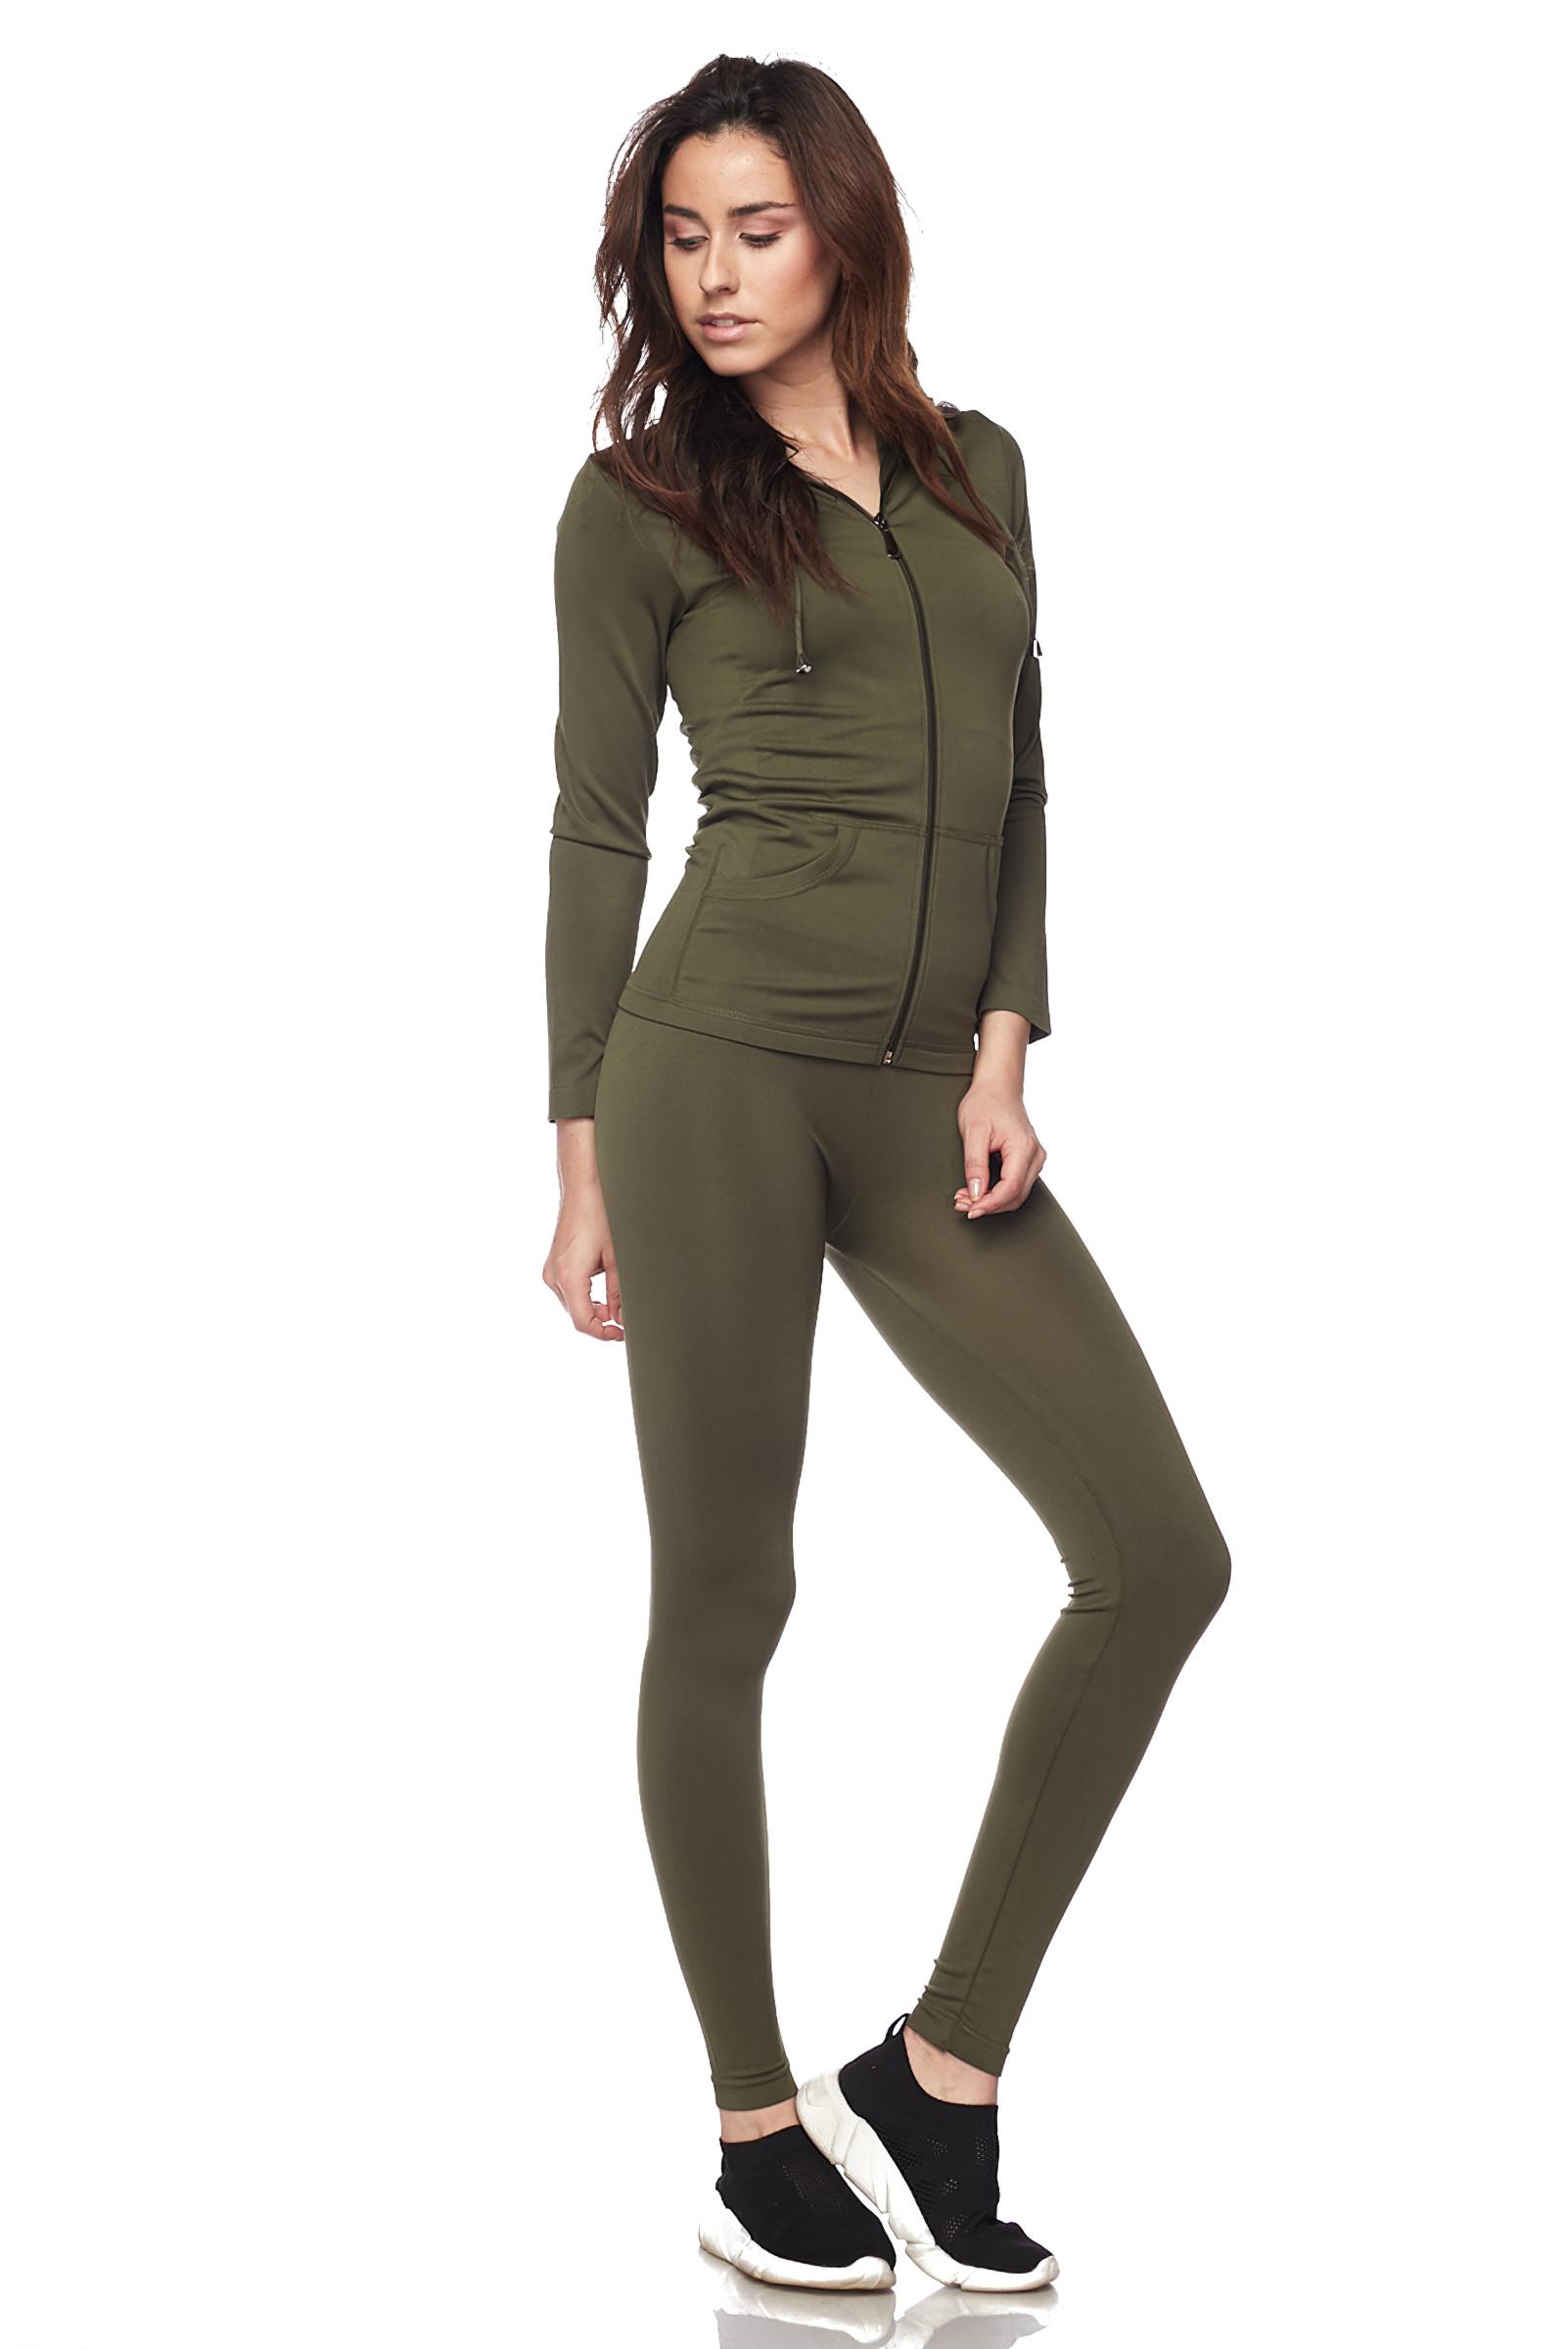 Women-039-s-Juniors-Active-Set-Wear-Zip-Up-Hoodie-and-Legging thumbnail 34